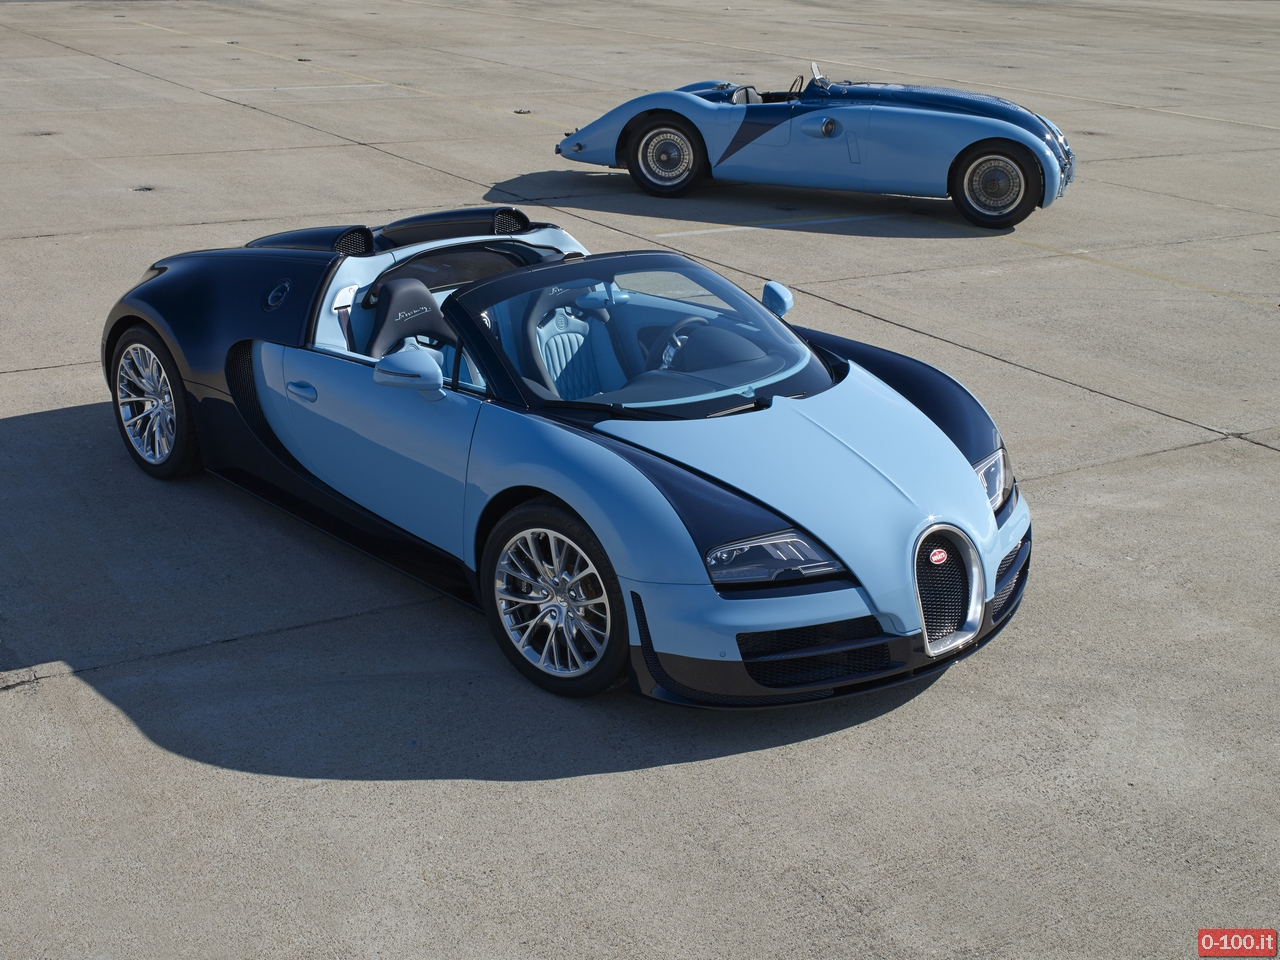 Bugatti-Veyron-16.4-Grand Sport-Vitesse-six-part-Legends-jean-pierre-wimille-57g-tank_0-100_4